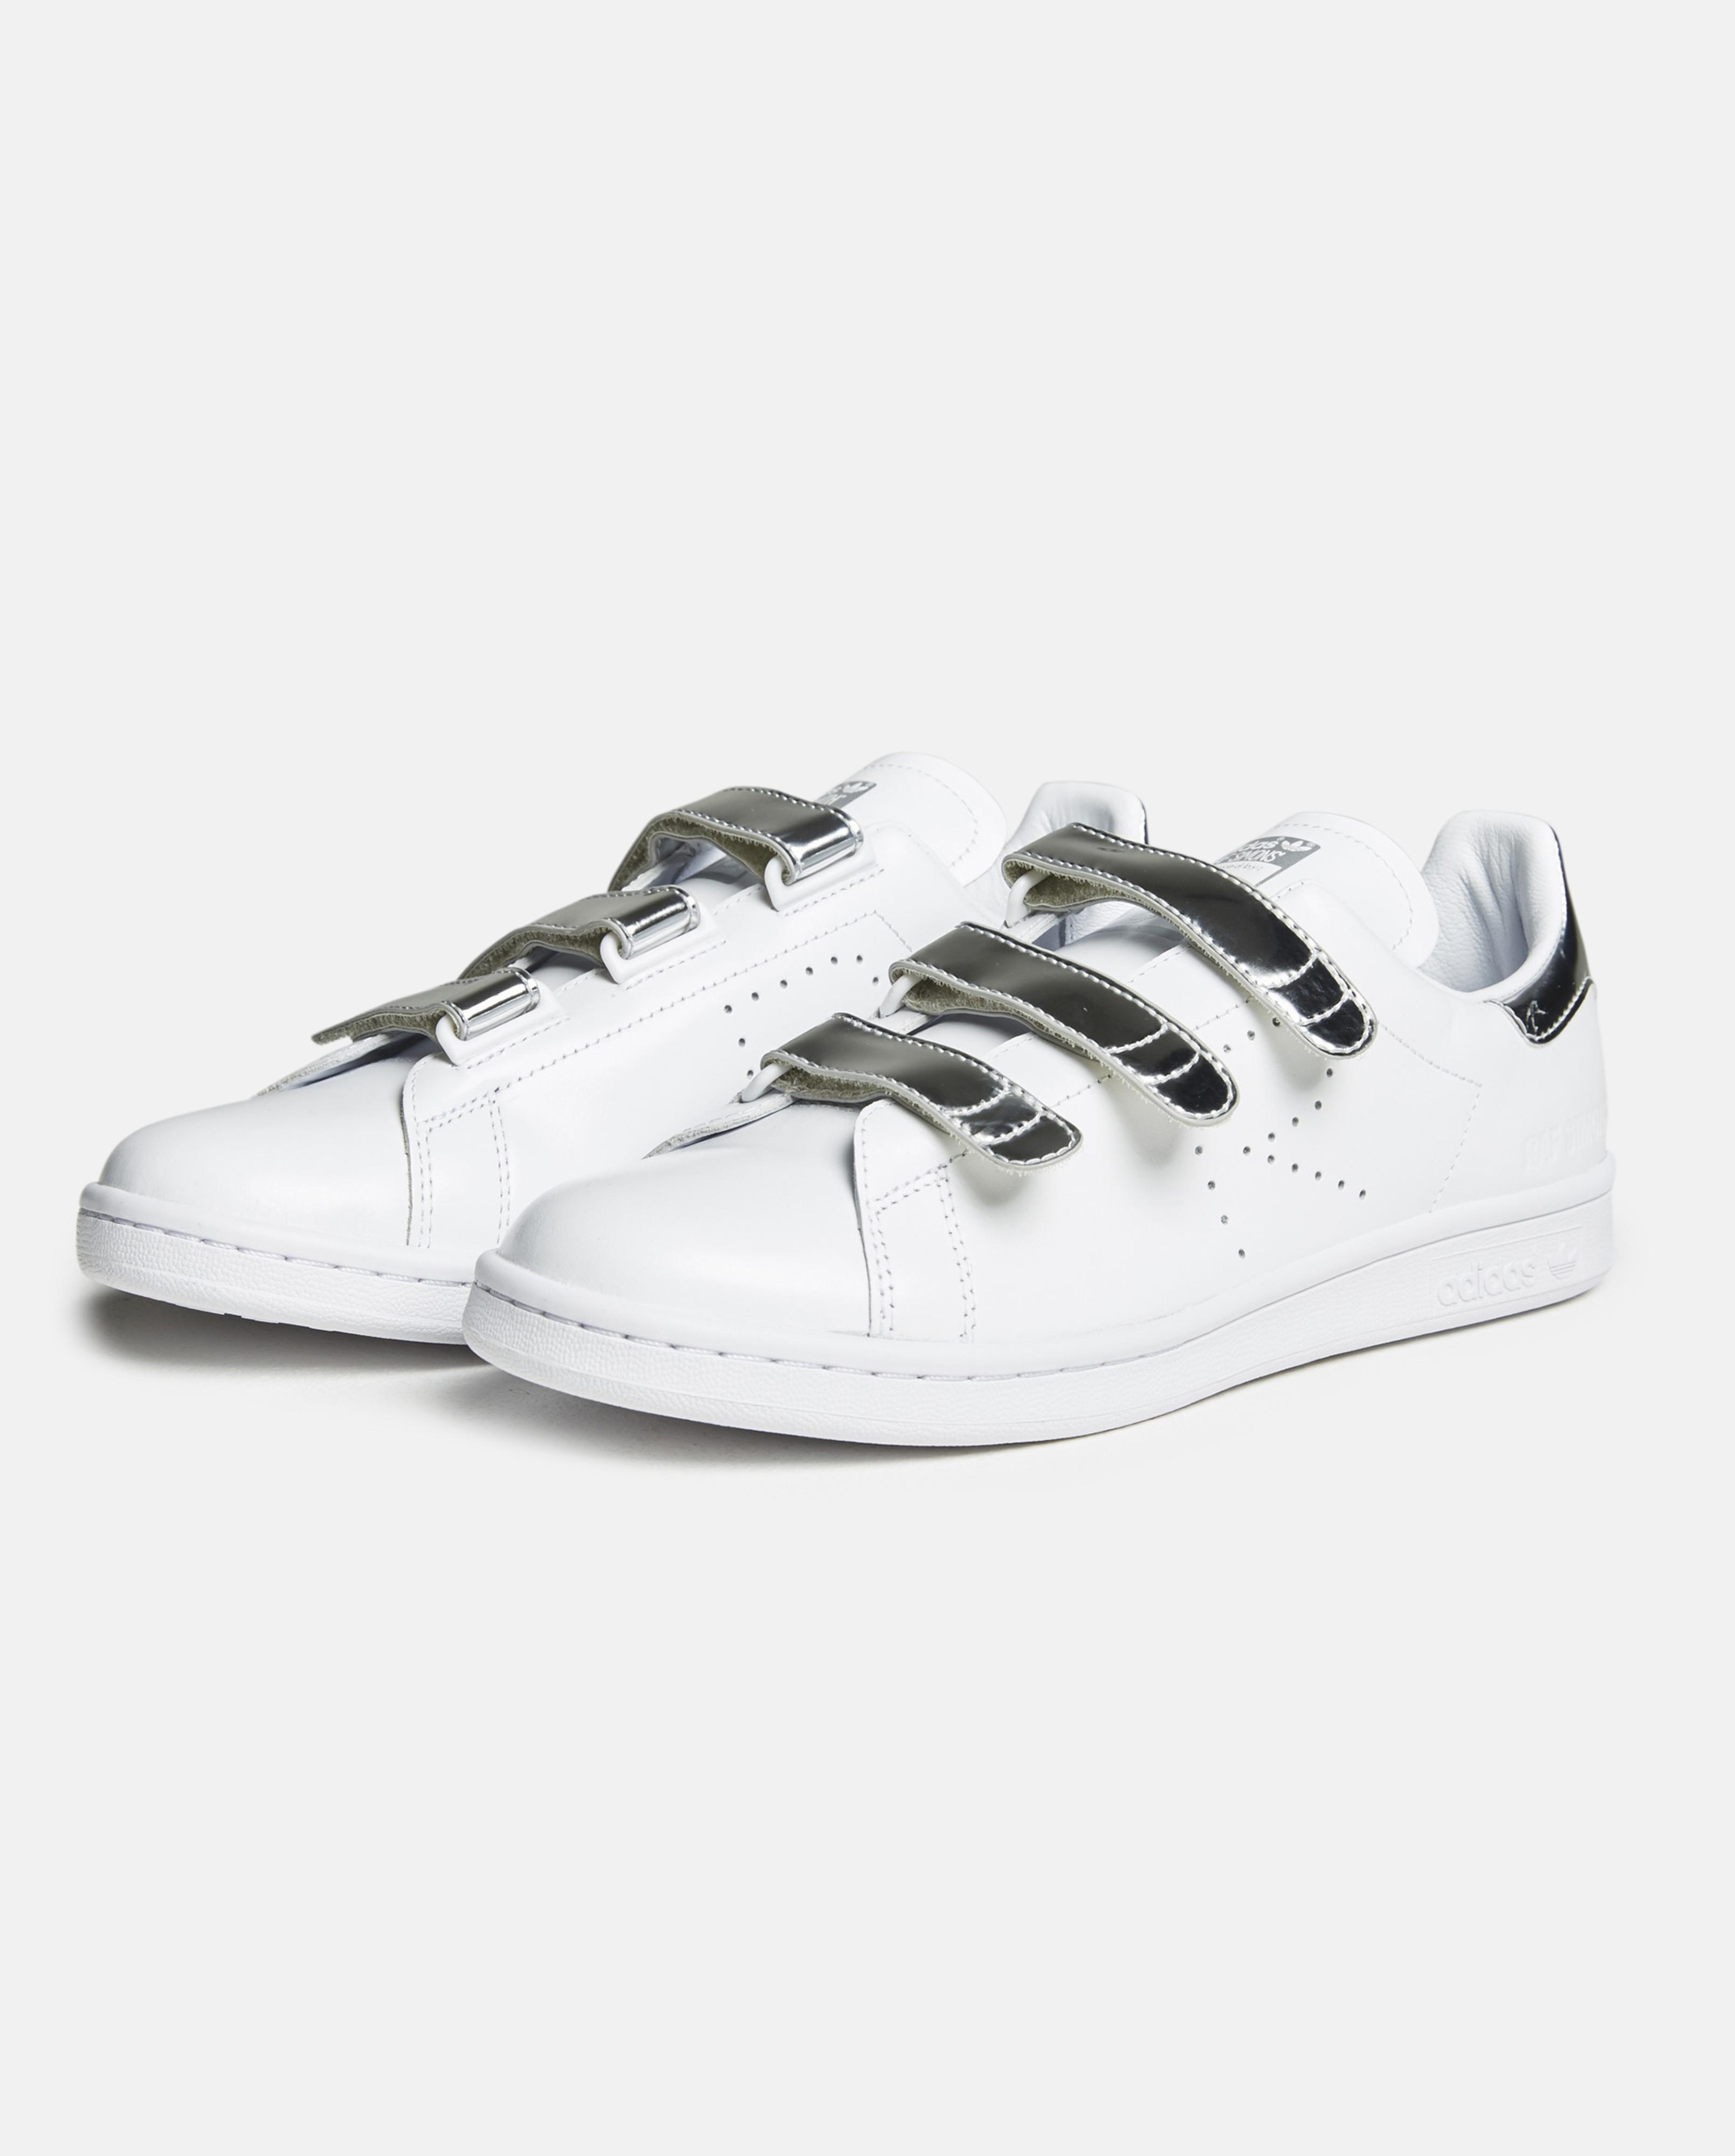 3f8a71794898 Lyst - adidas By Raf Simons Raf X Stan Smith Cf Leather Trainers in ...